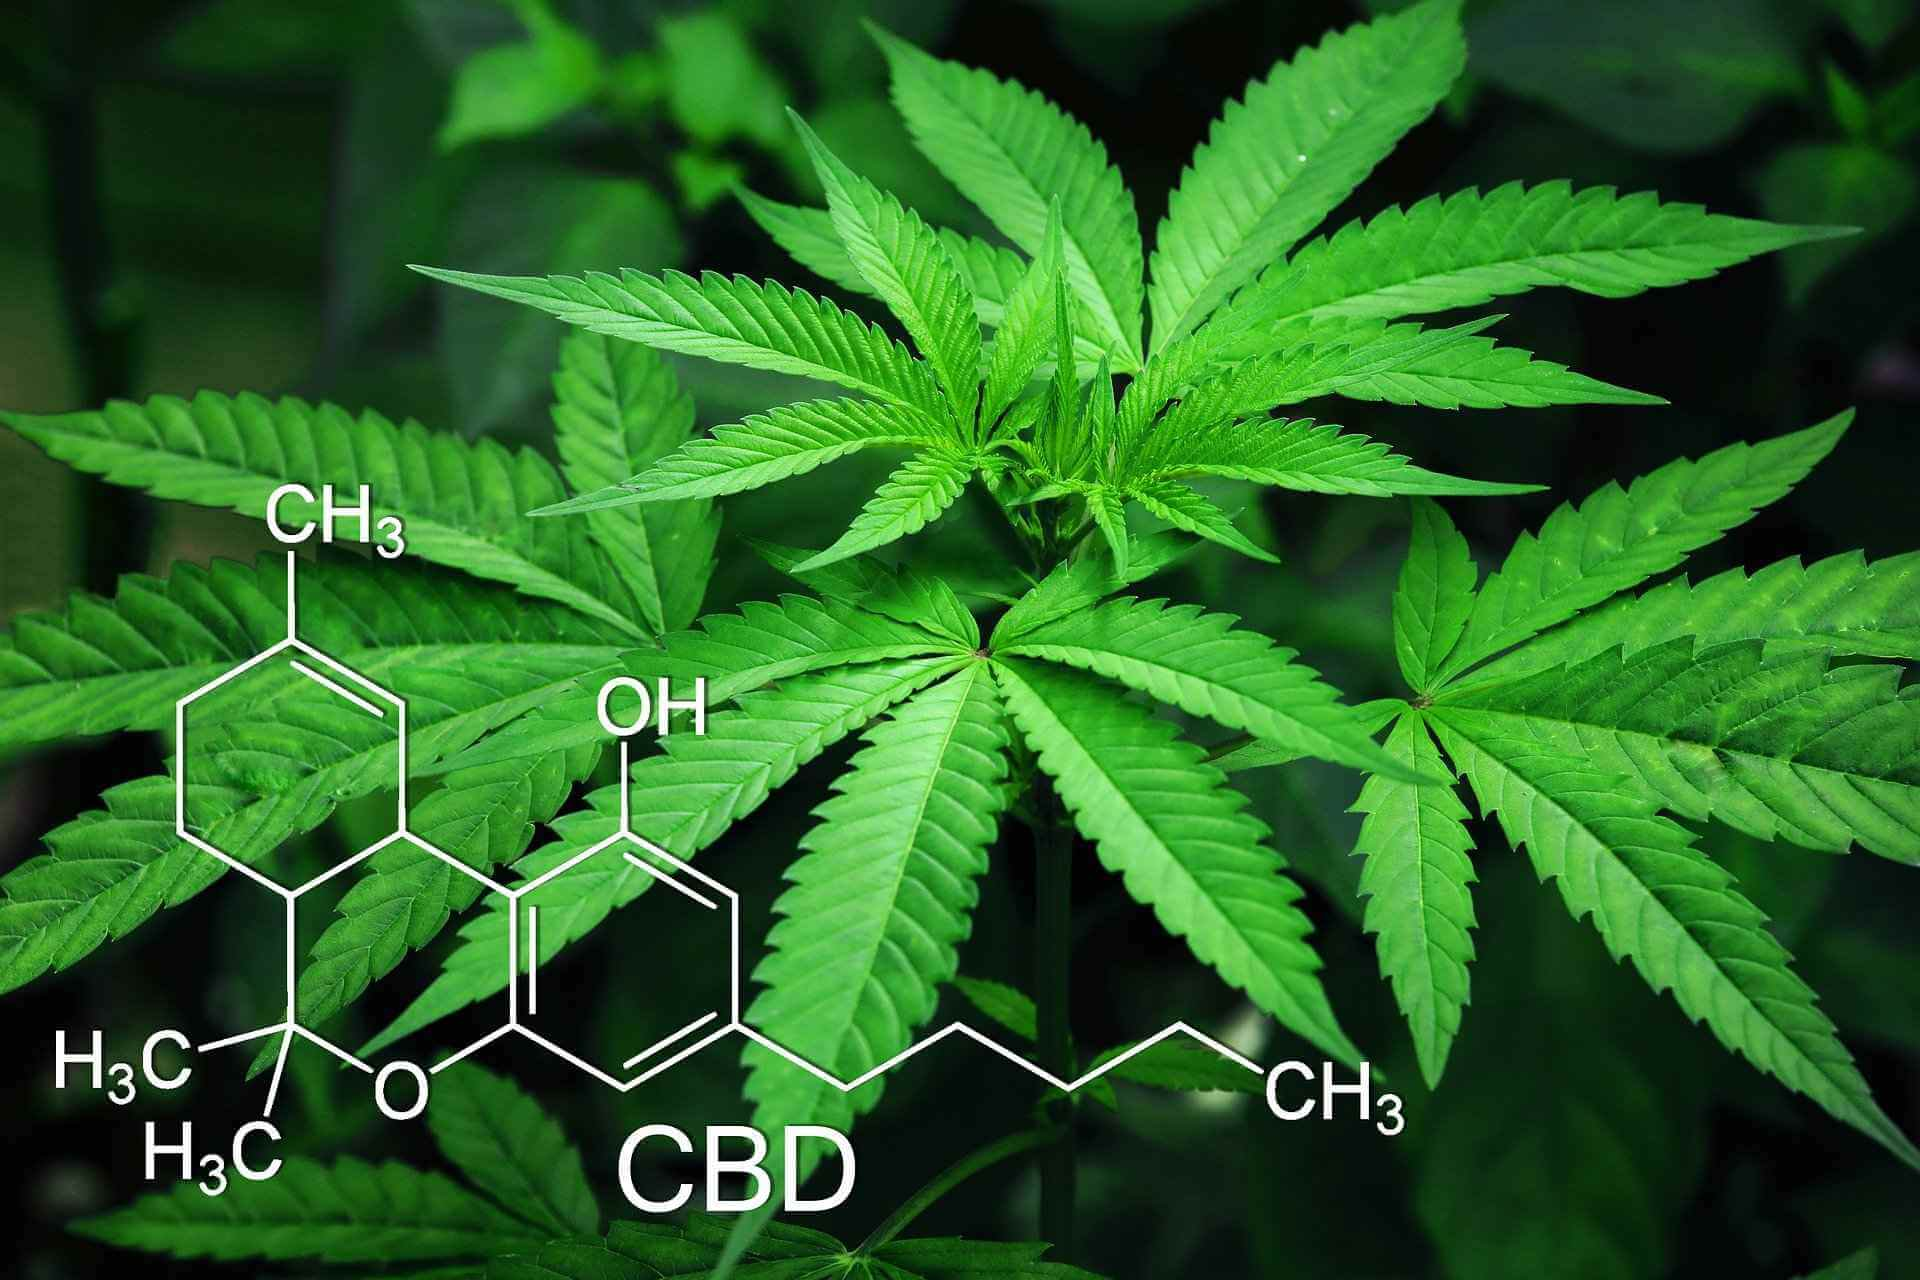 Kannabinoidy i układ endokannabinoidowy, a CBD